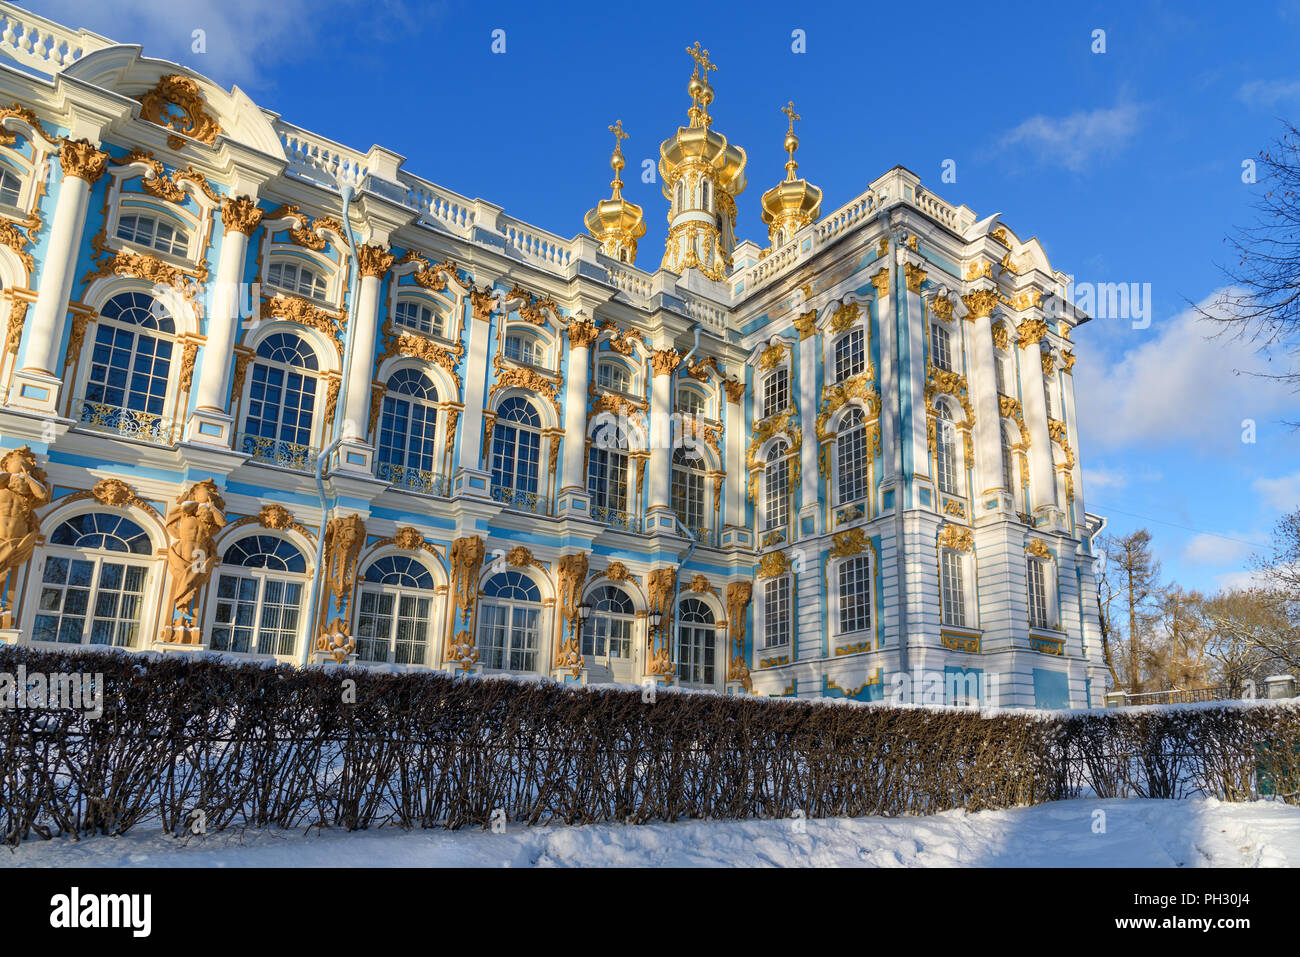 Catherine palace in Tsarskoe Selo in winter. Pushkin town. Saint Petersburg. Russia - Stock Image